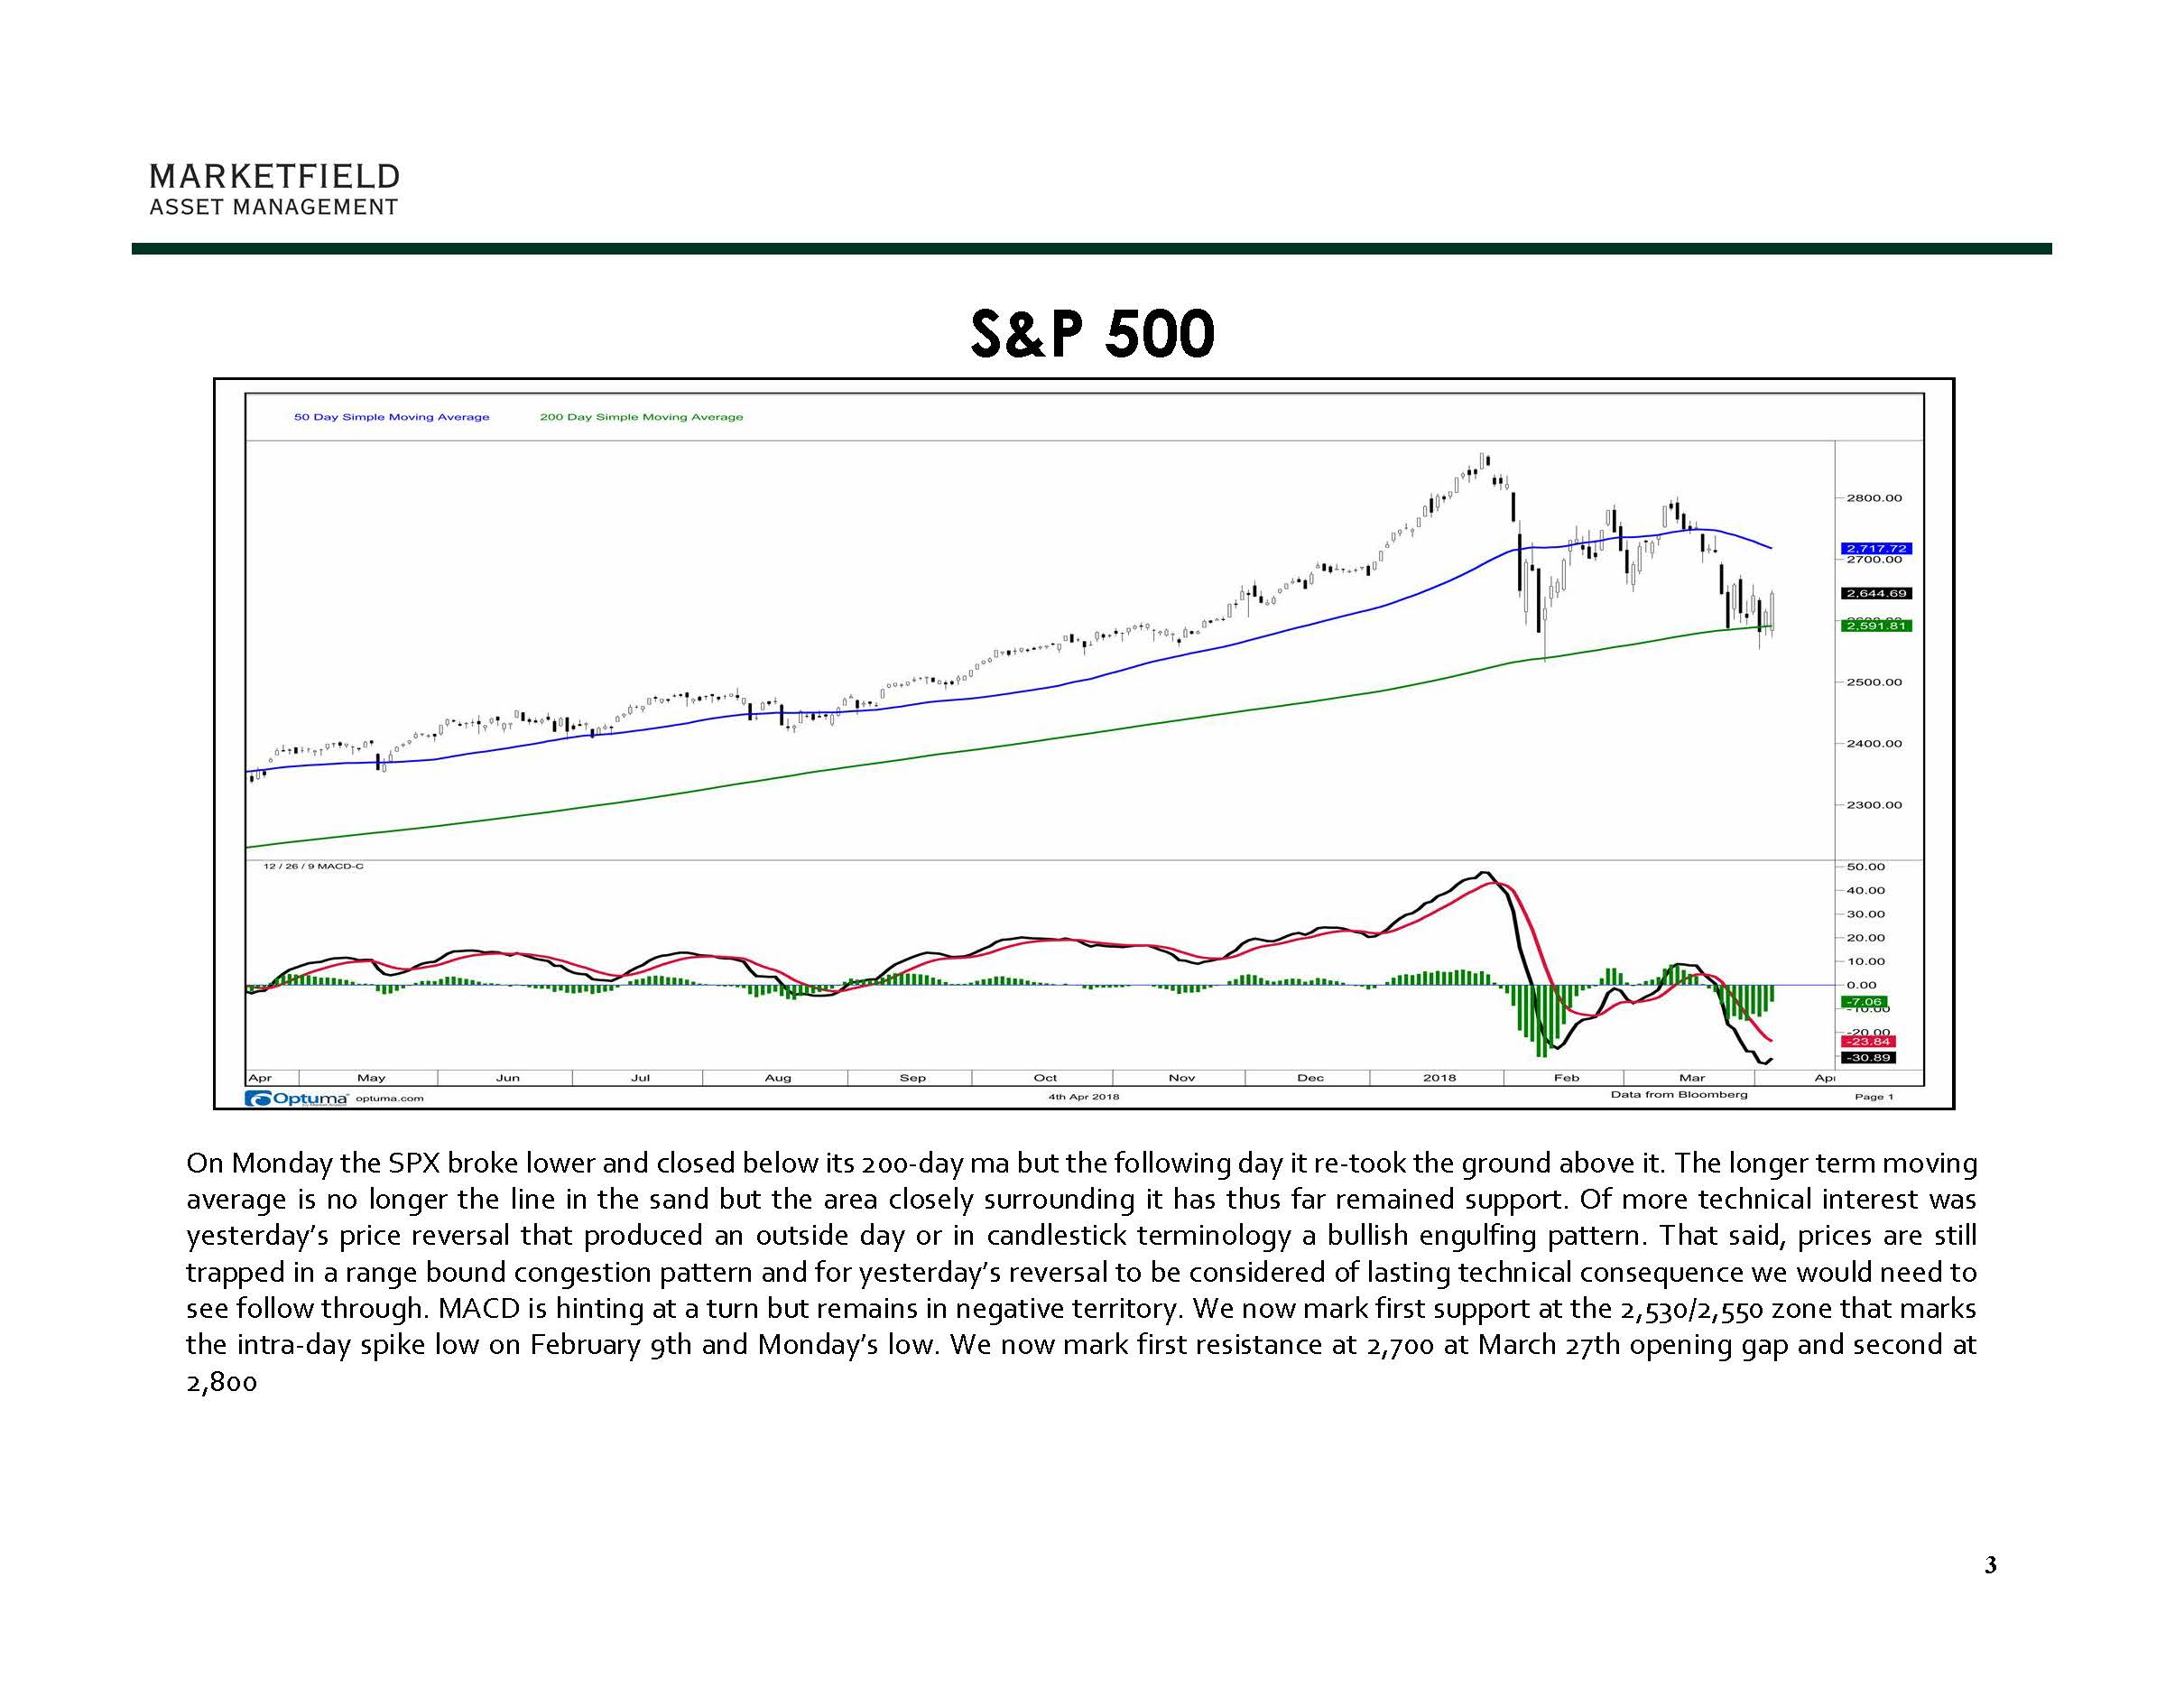 April 5_Marketfield Weekly Speculator_Page_04.jpg